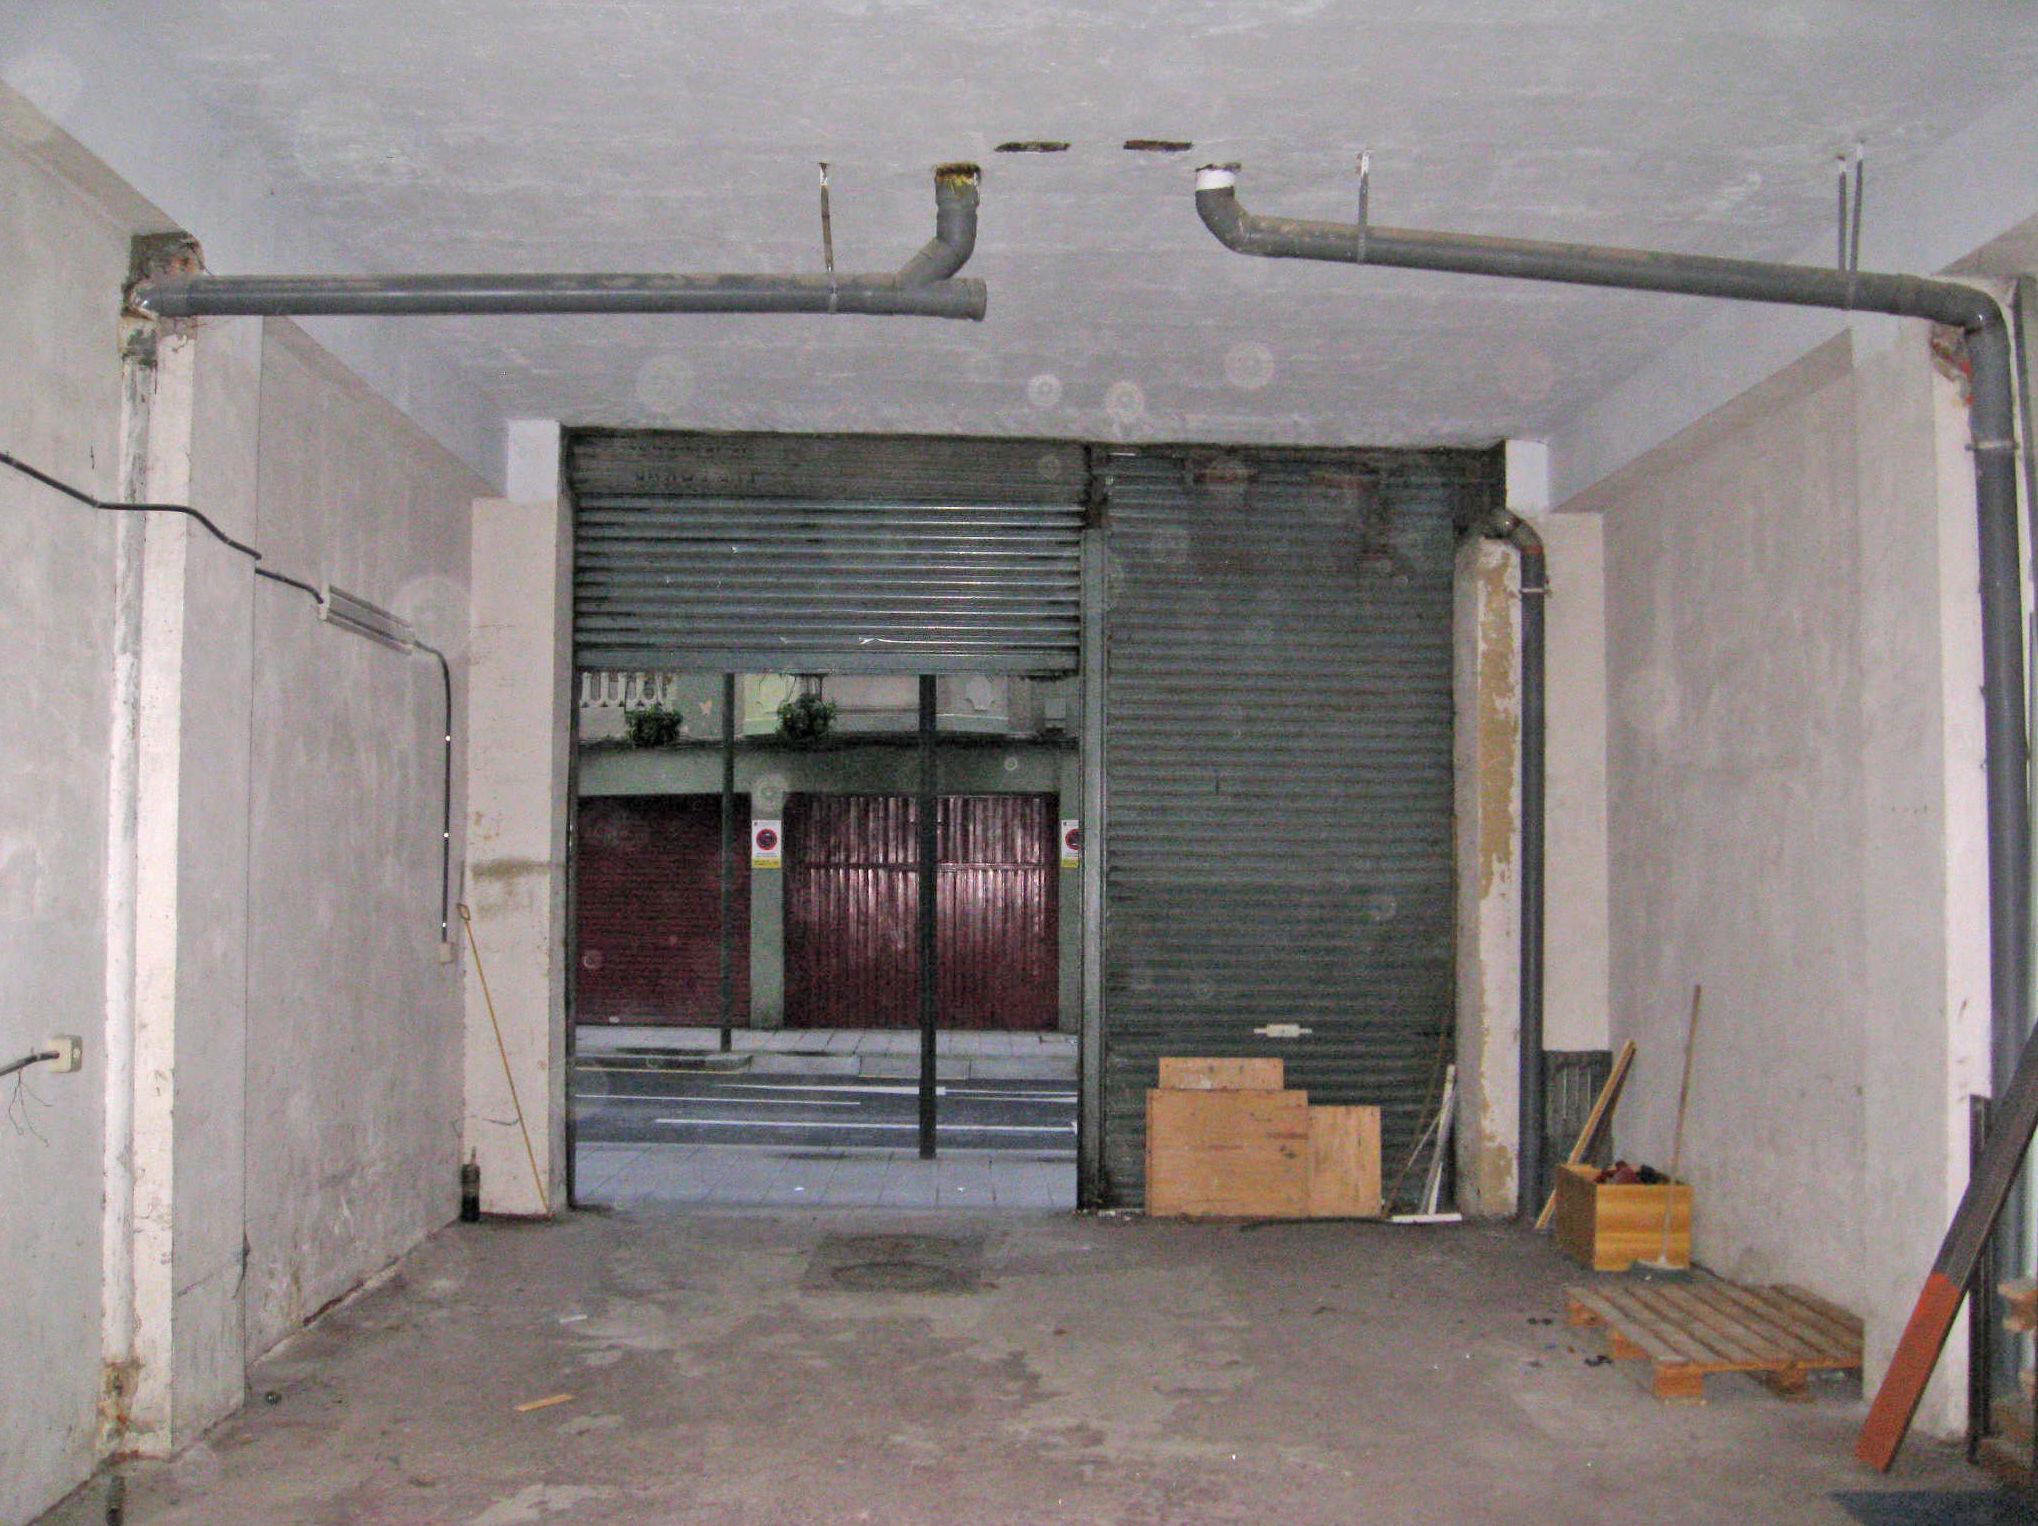 Proyecto de óptica - Erandio (Bizkaia)